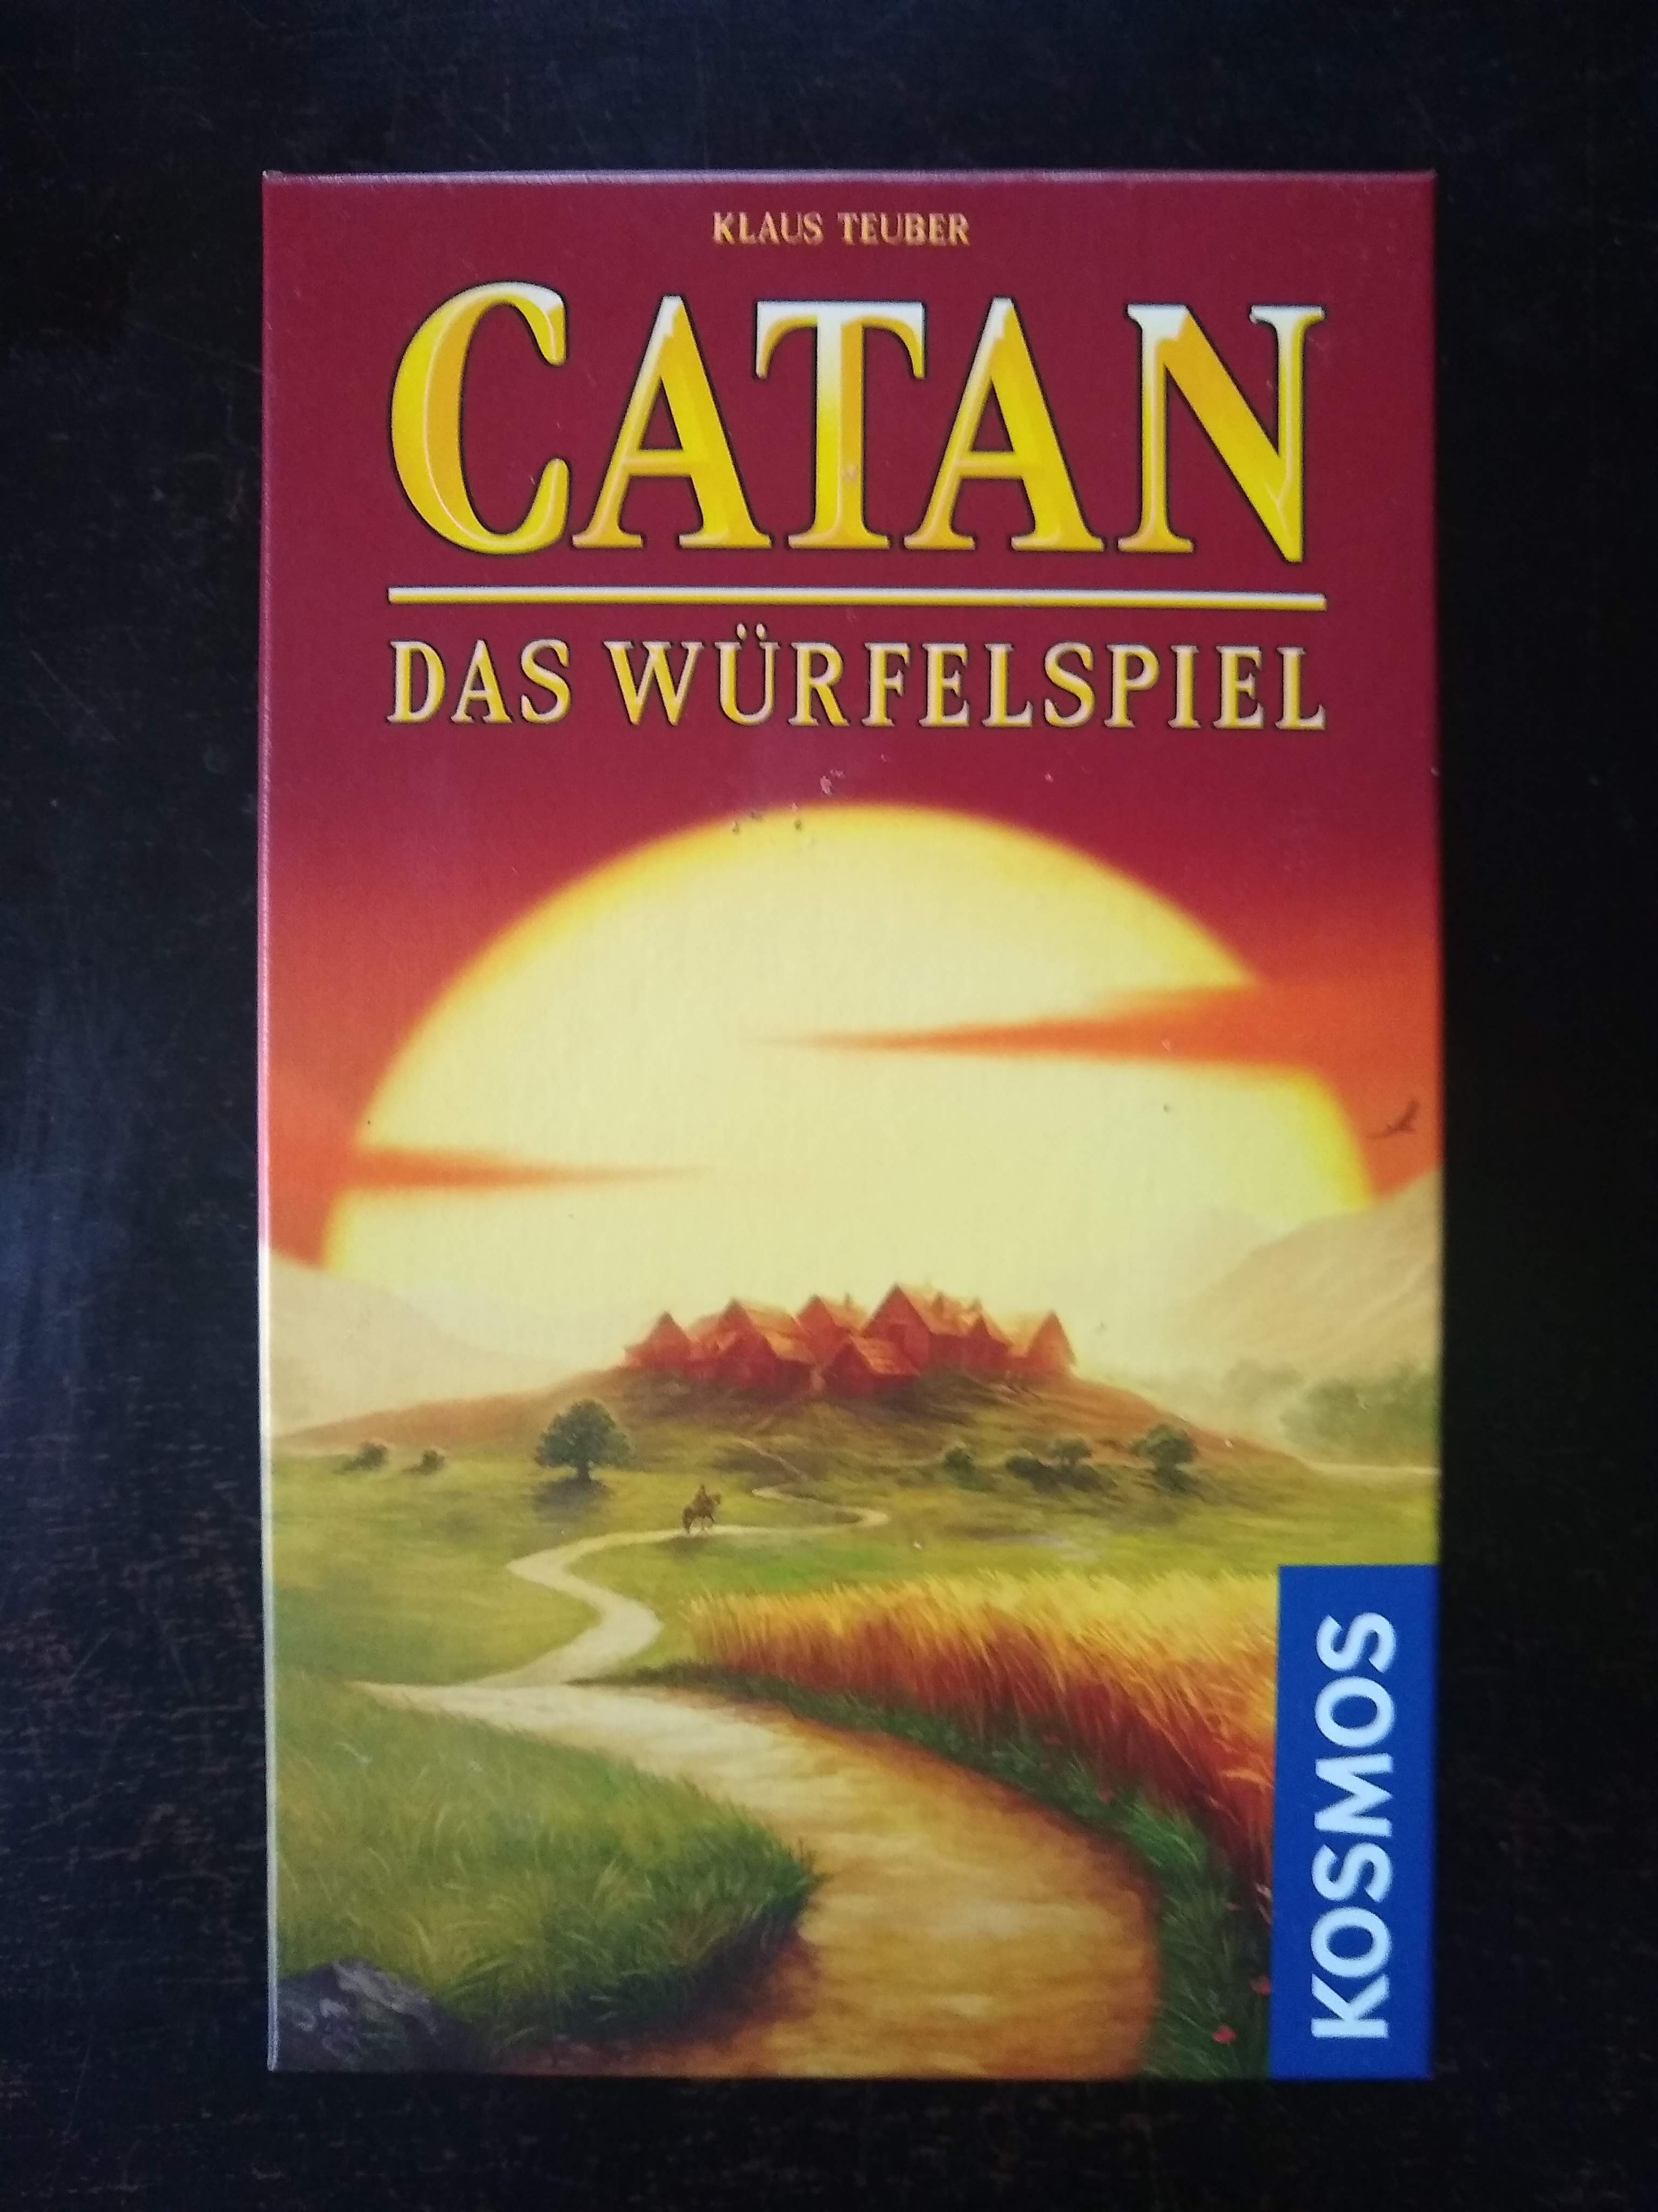 Catan dice game box